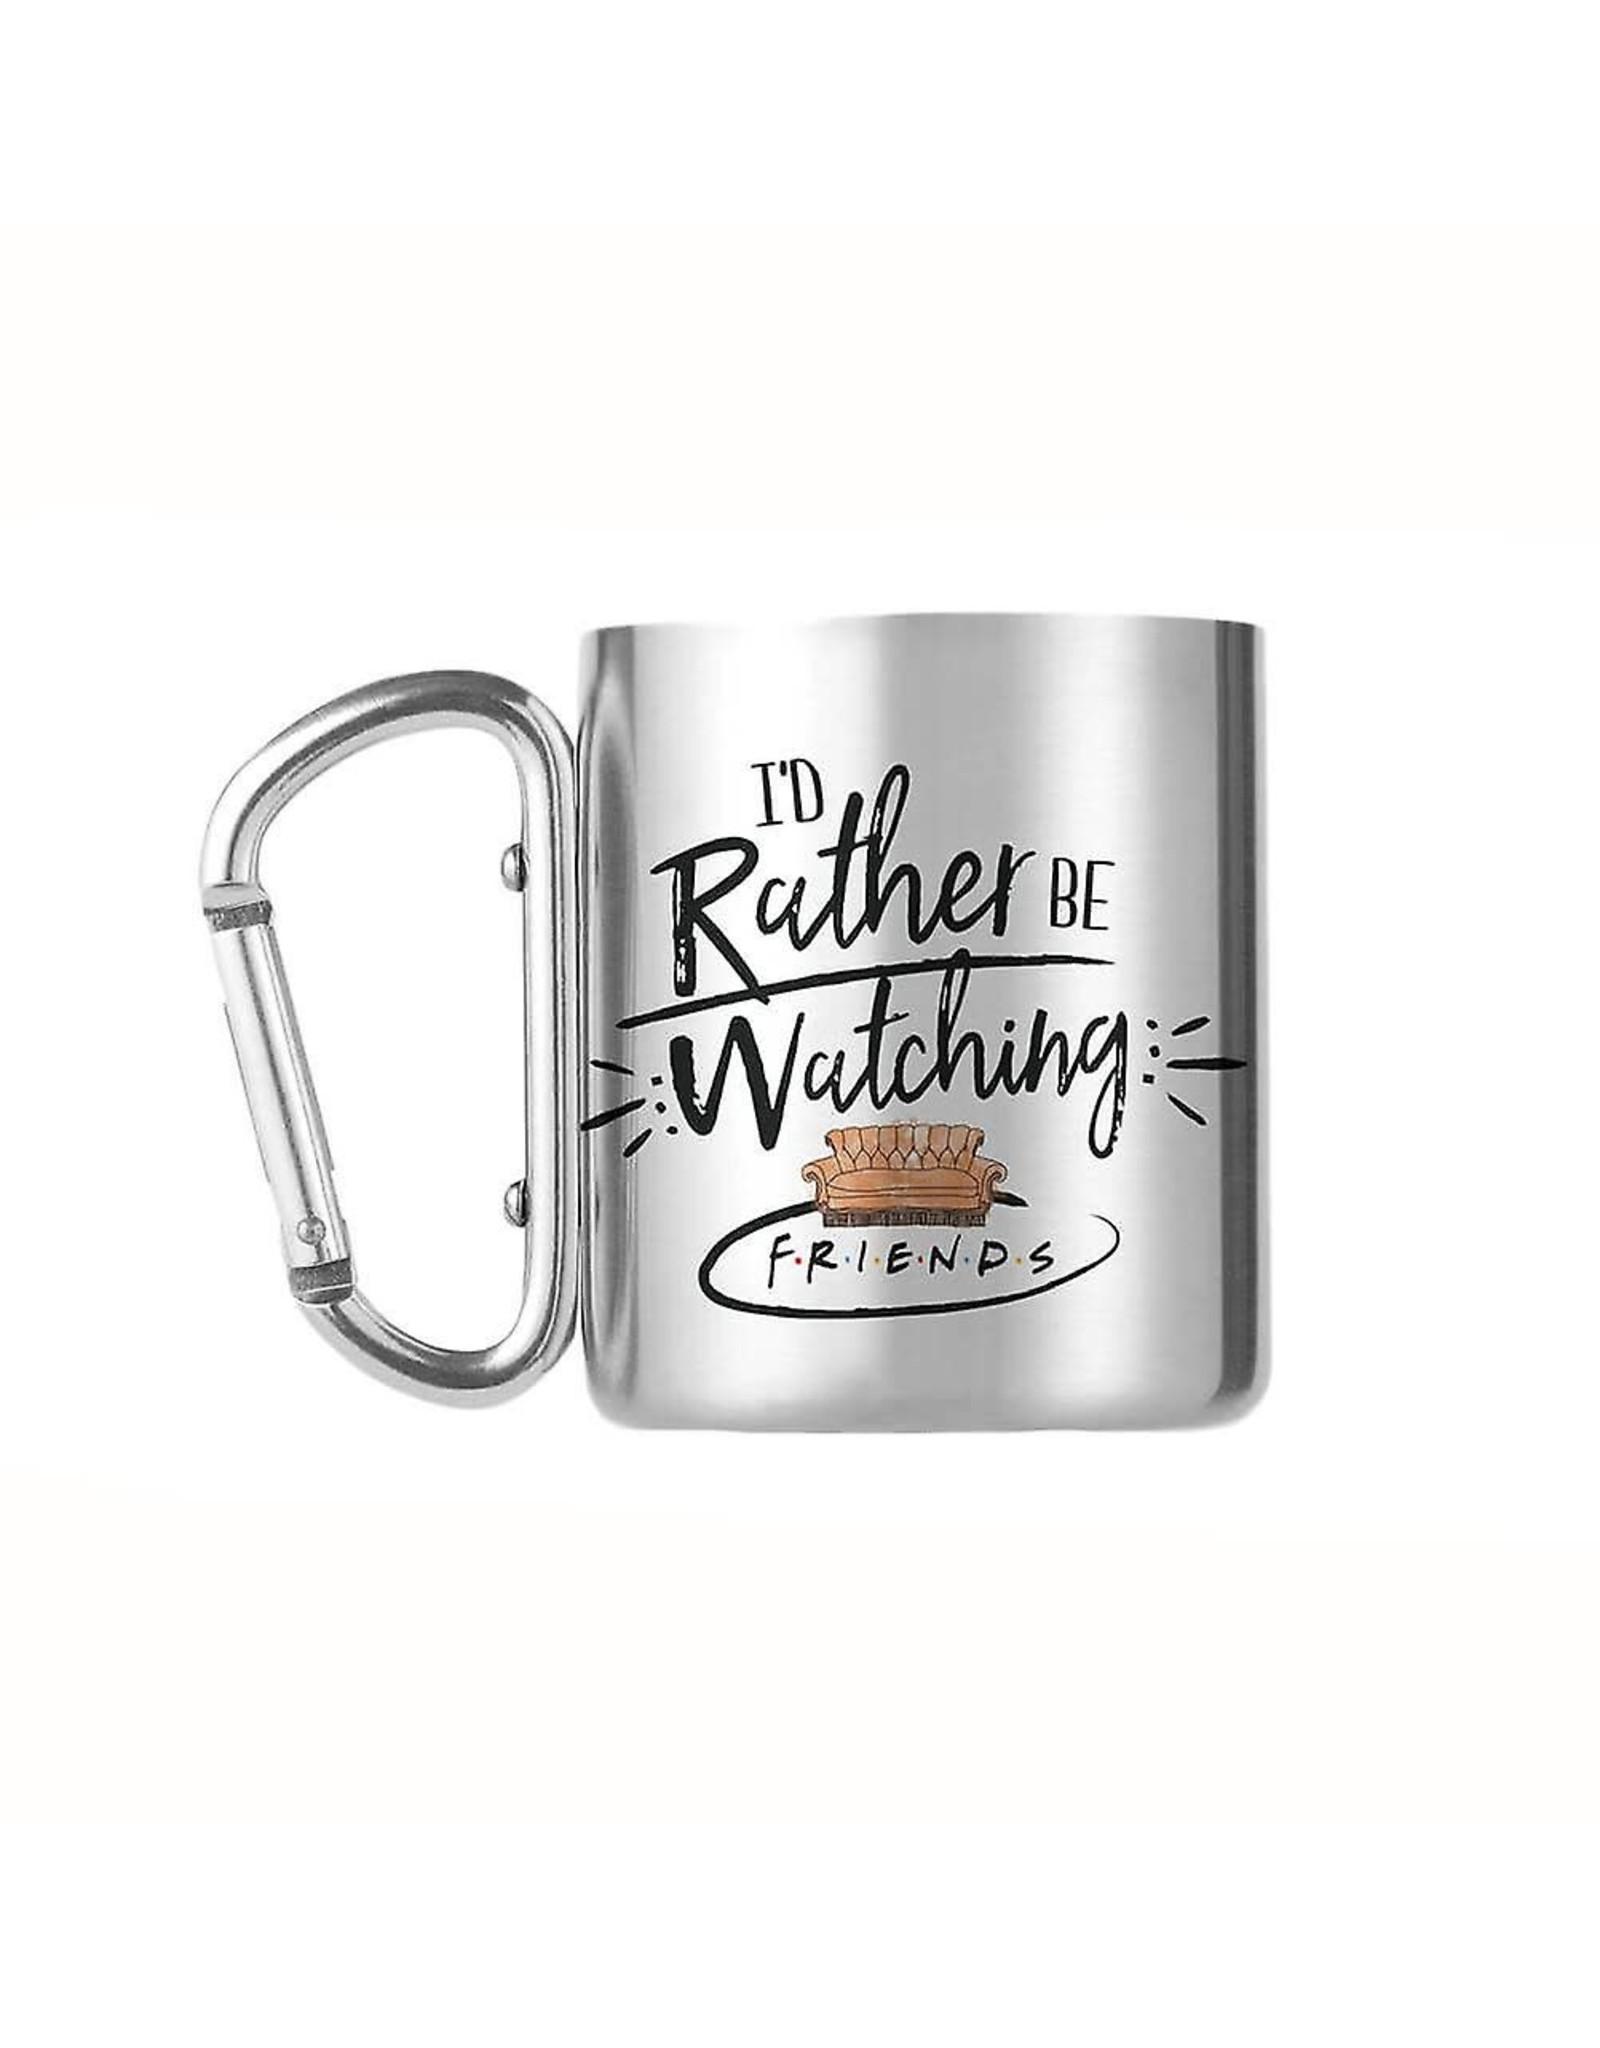 GBEye FRIENDS Carabiner Mug 240ml - Rather Be Watching